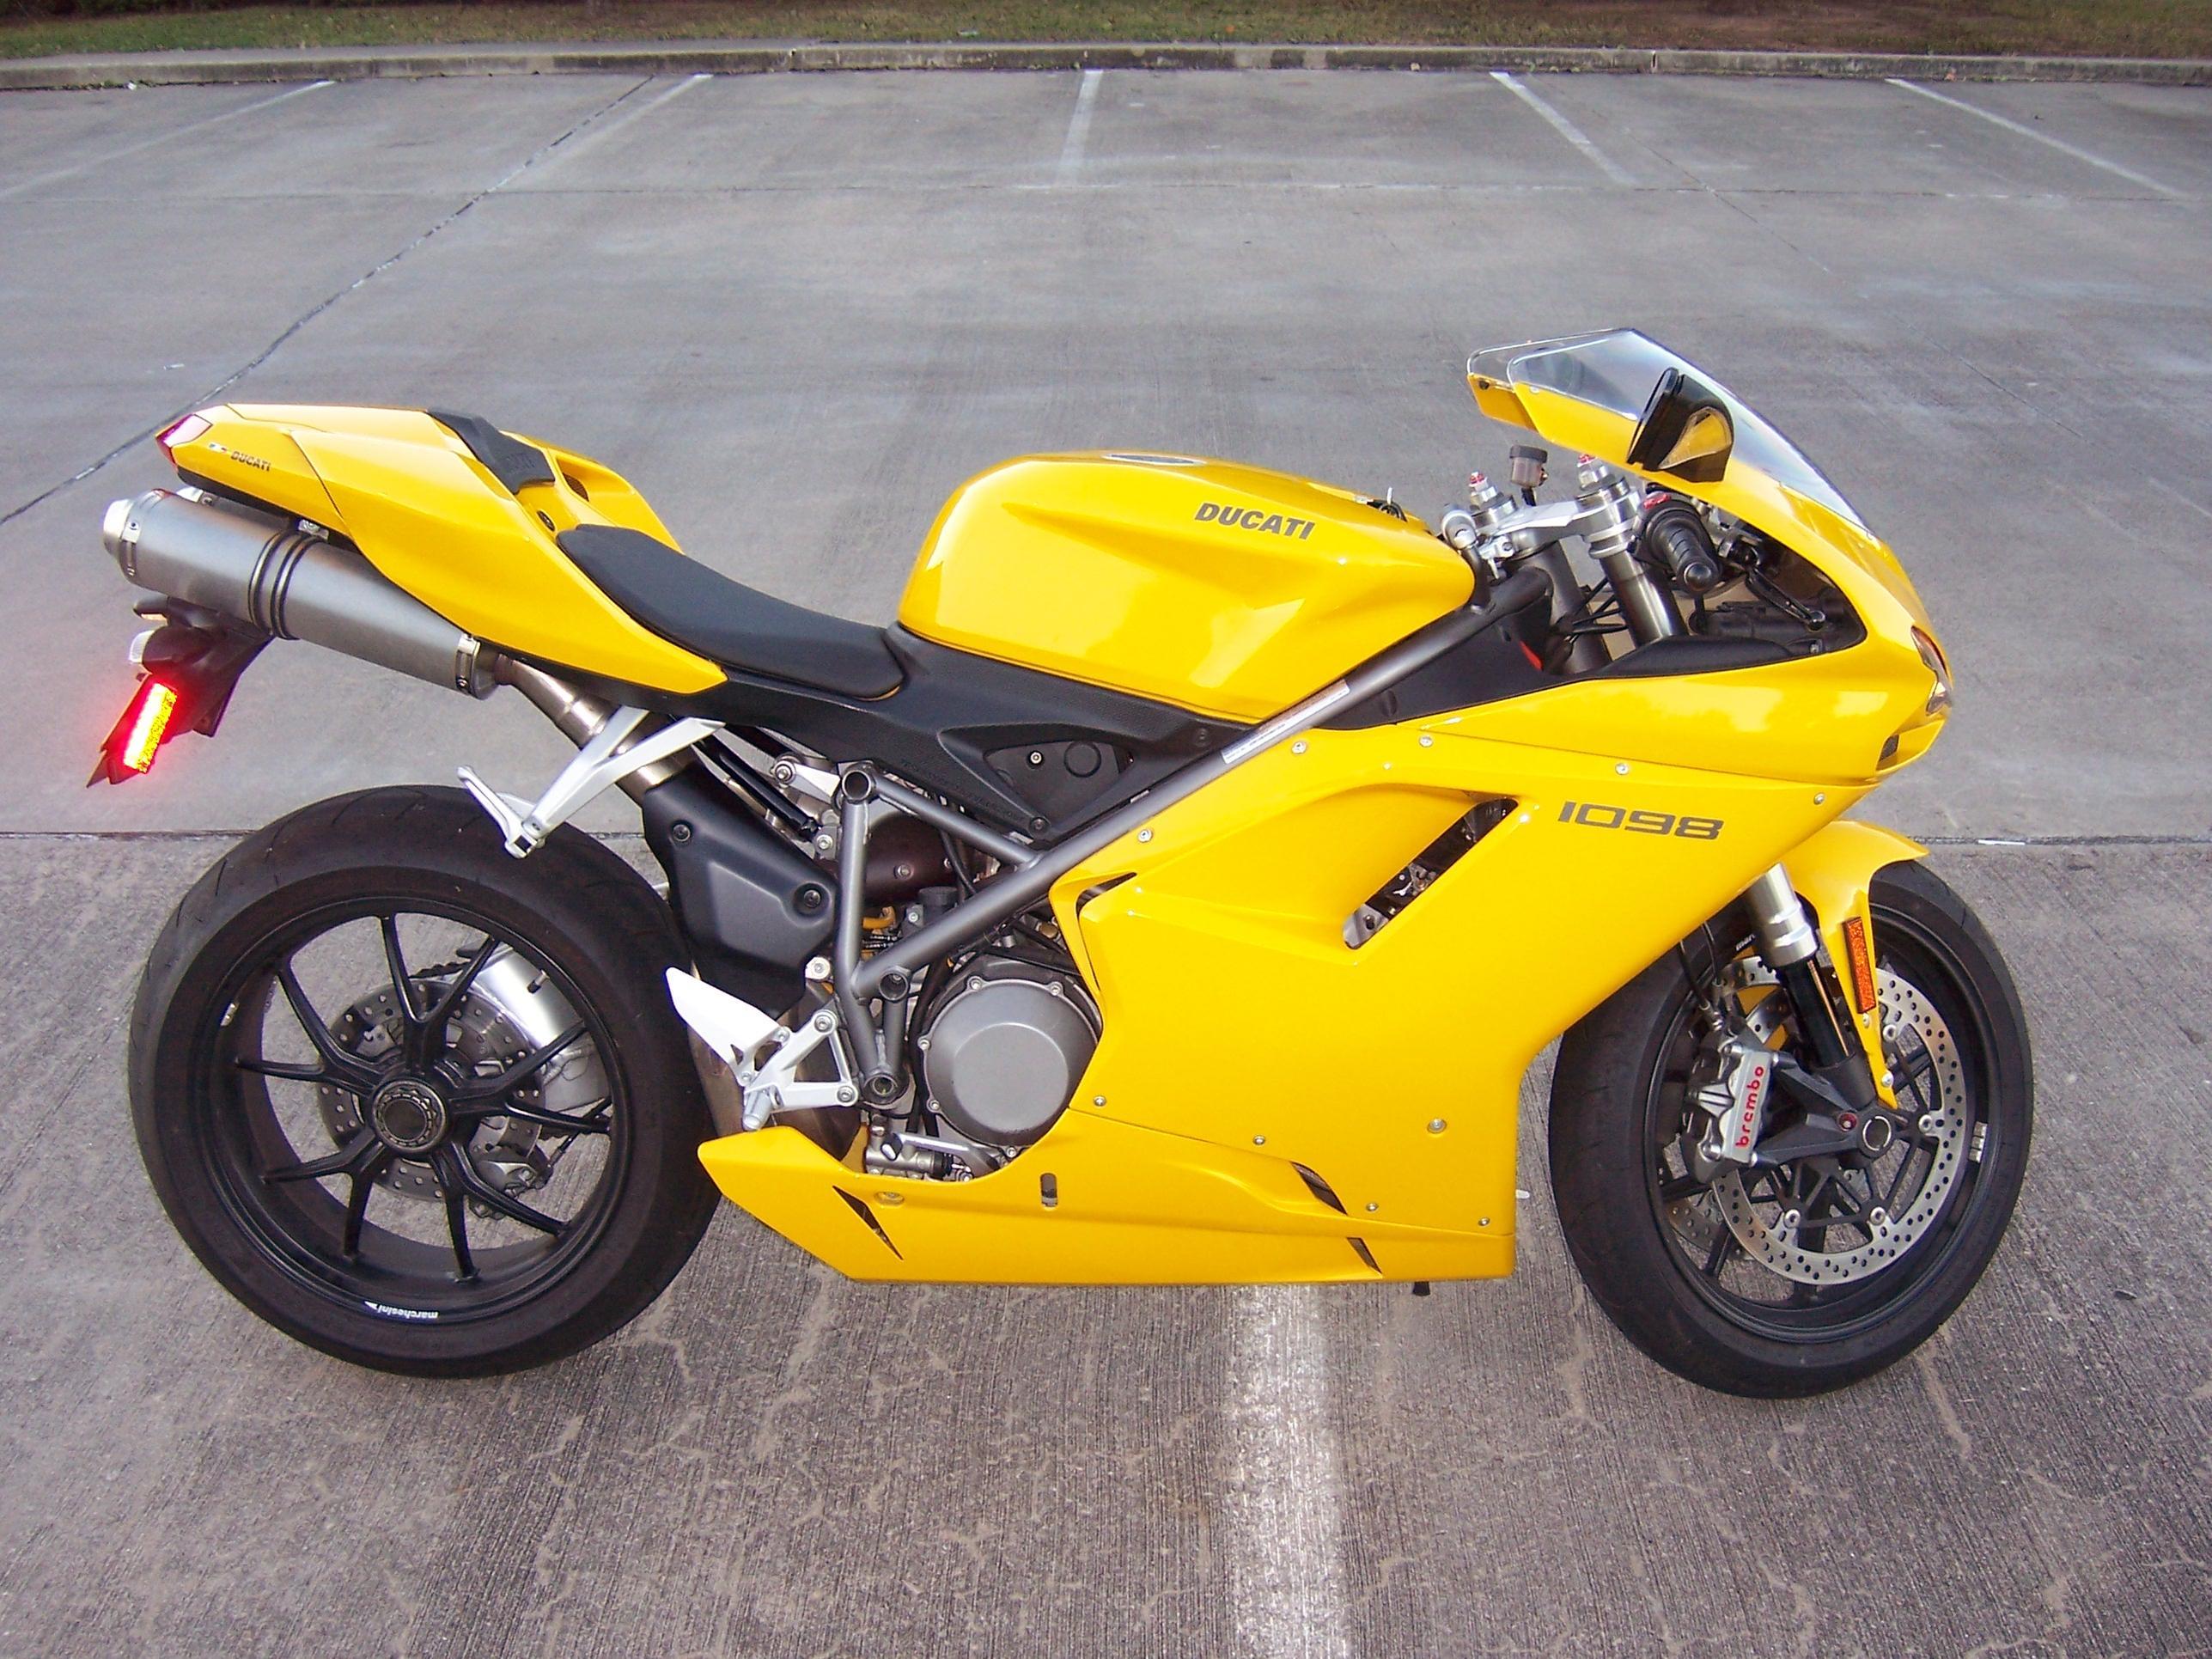 2008 Ducati 1098 Rare Yellow! Low Miles! - ducati.org forum | the ...